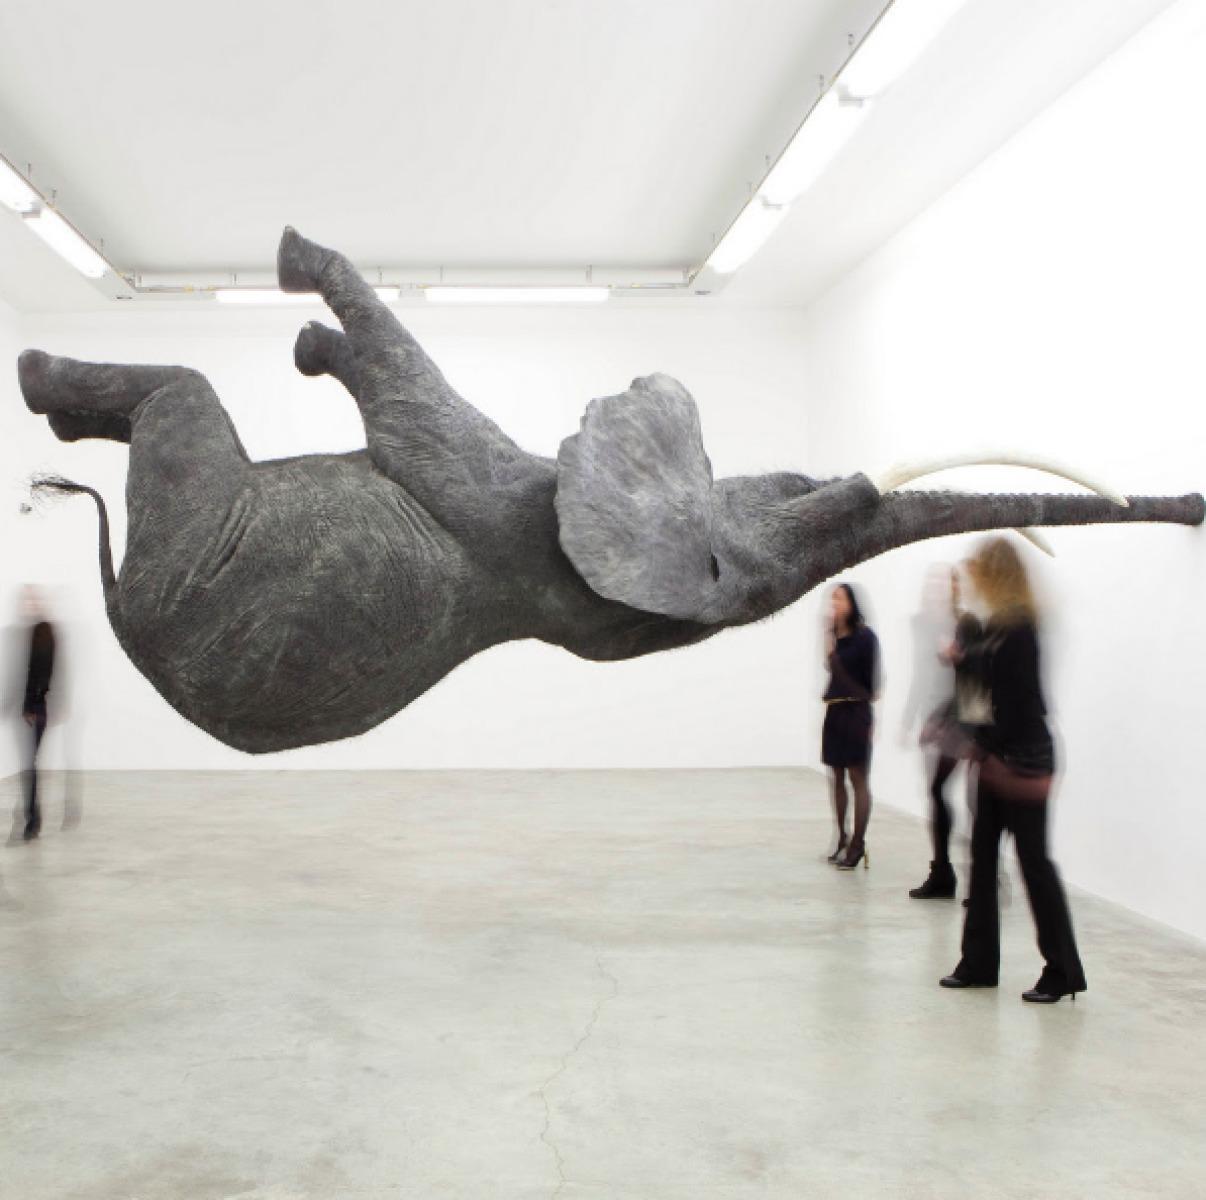 Animals in art, Daniel Firman